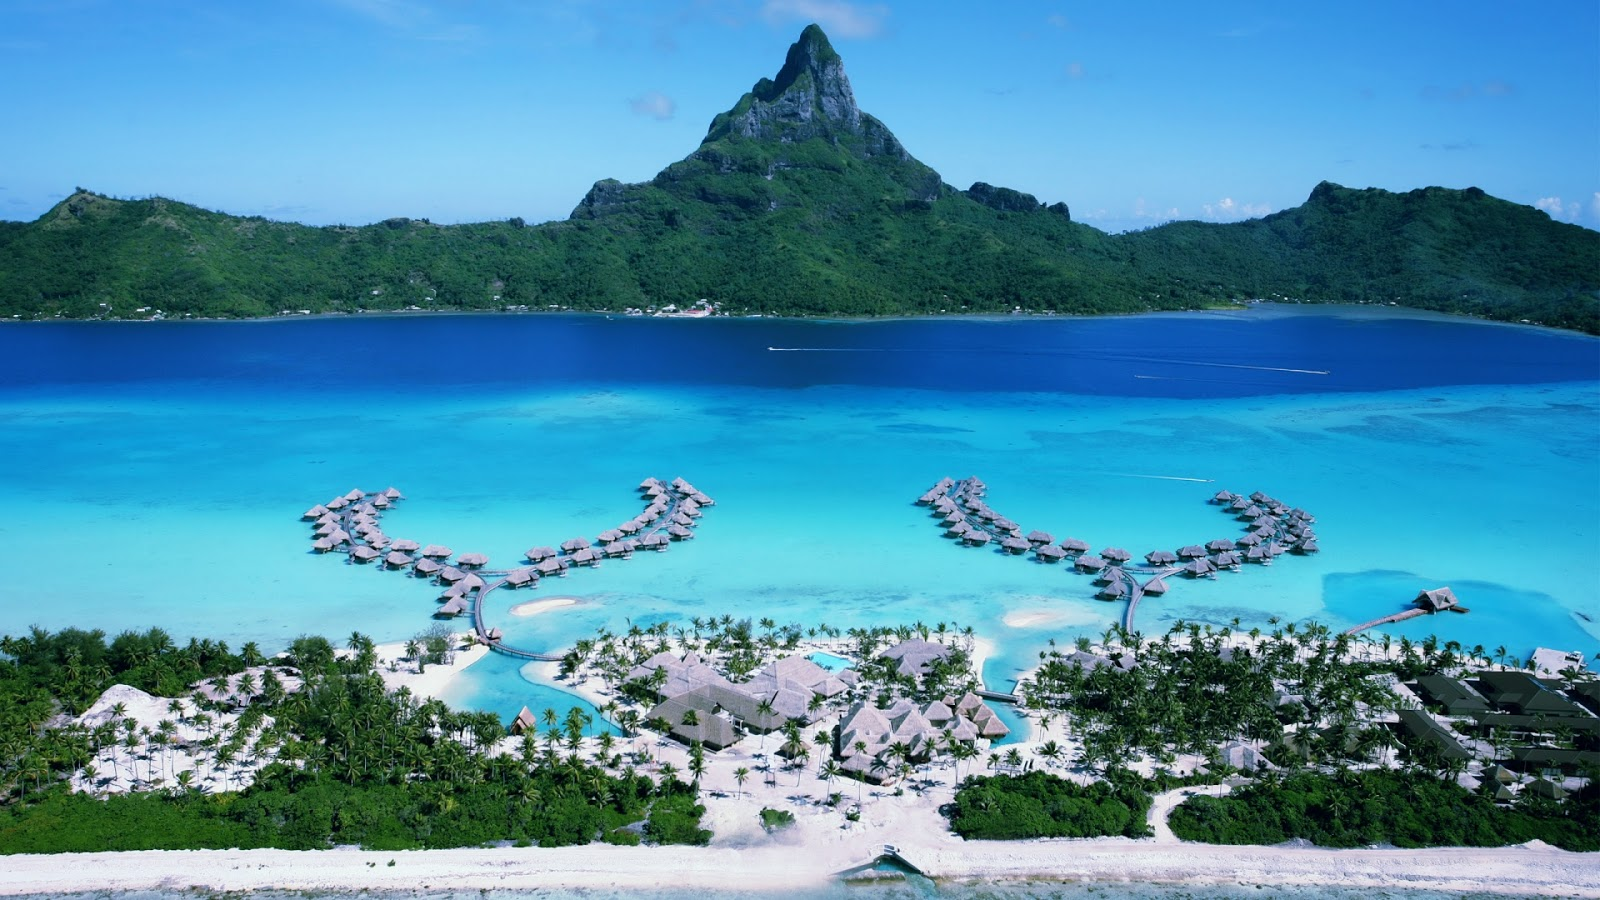 Bora Bora | Full HD Desktop Wallpapers 1080p